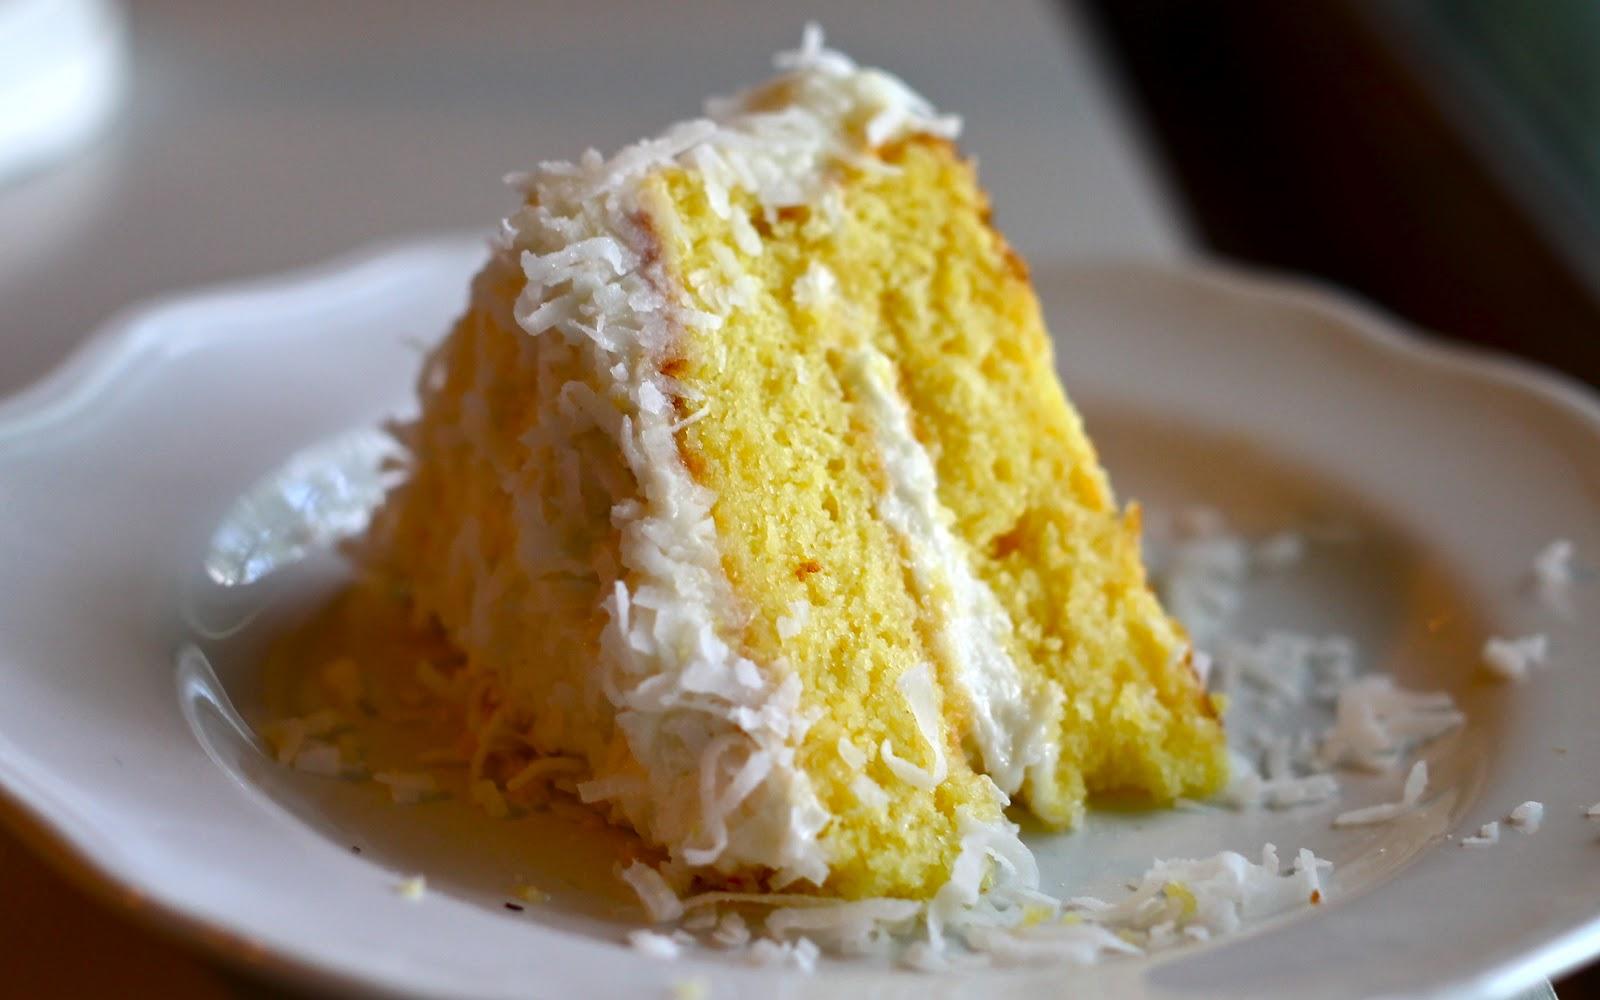 piña colada cake cake 3 4 cup butter 1 cup